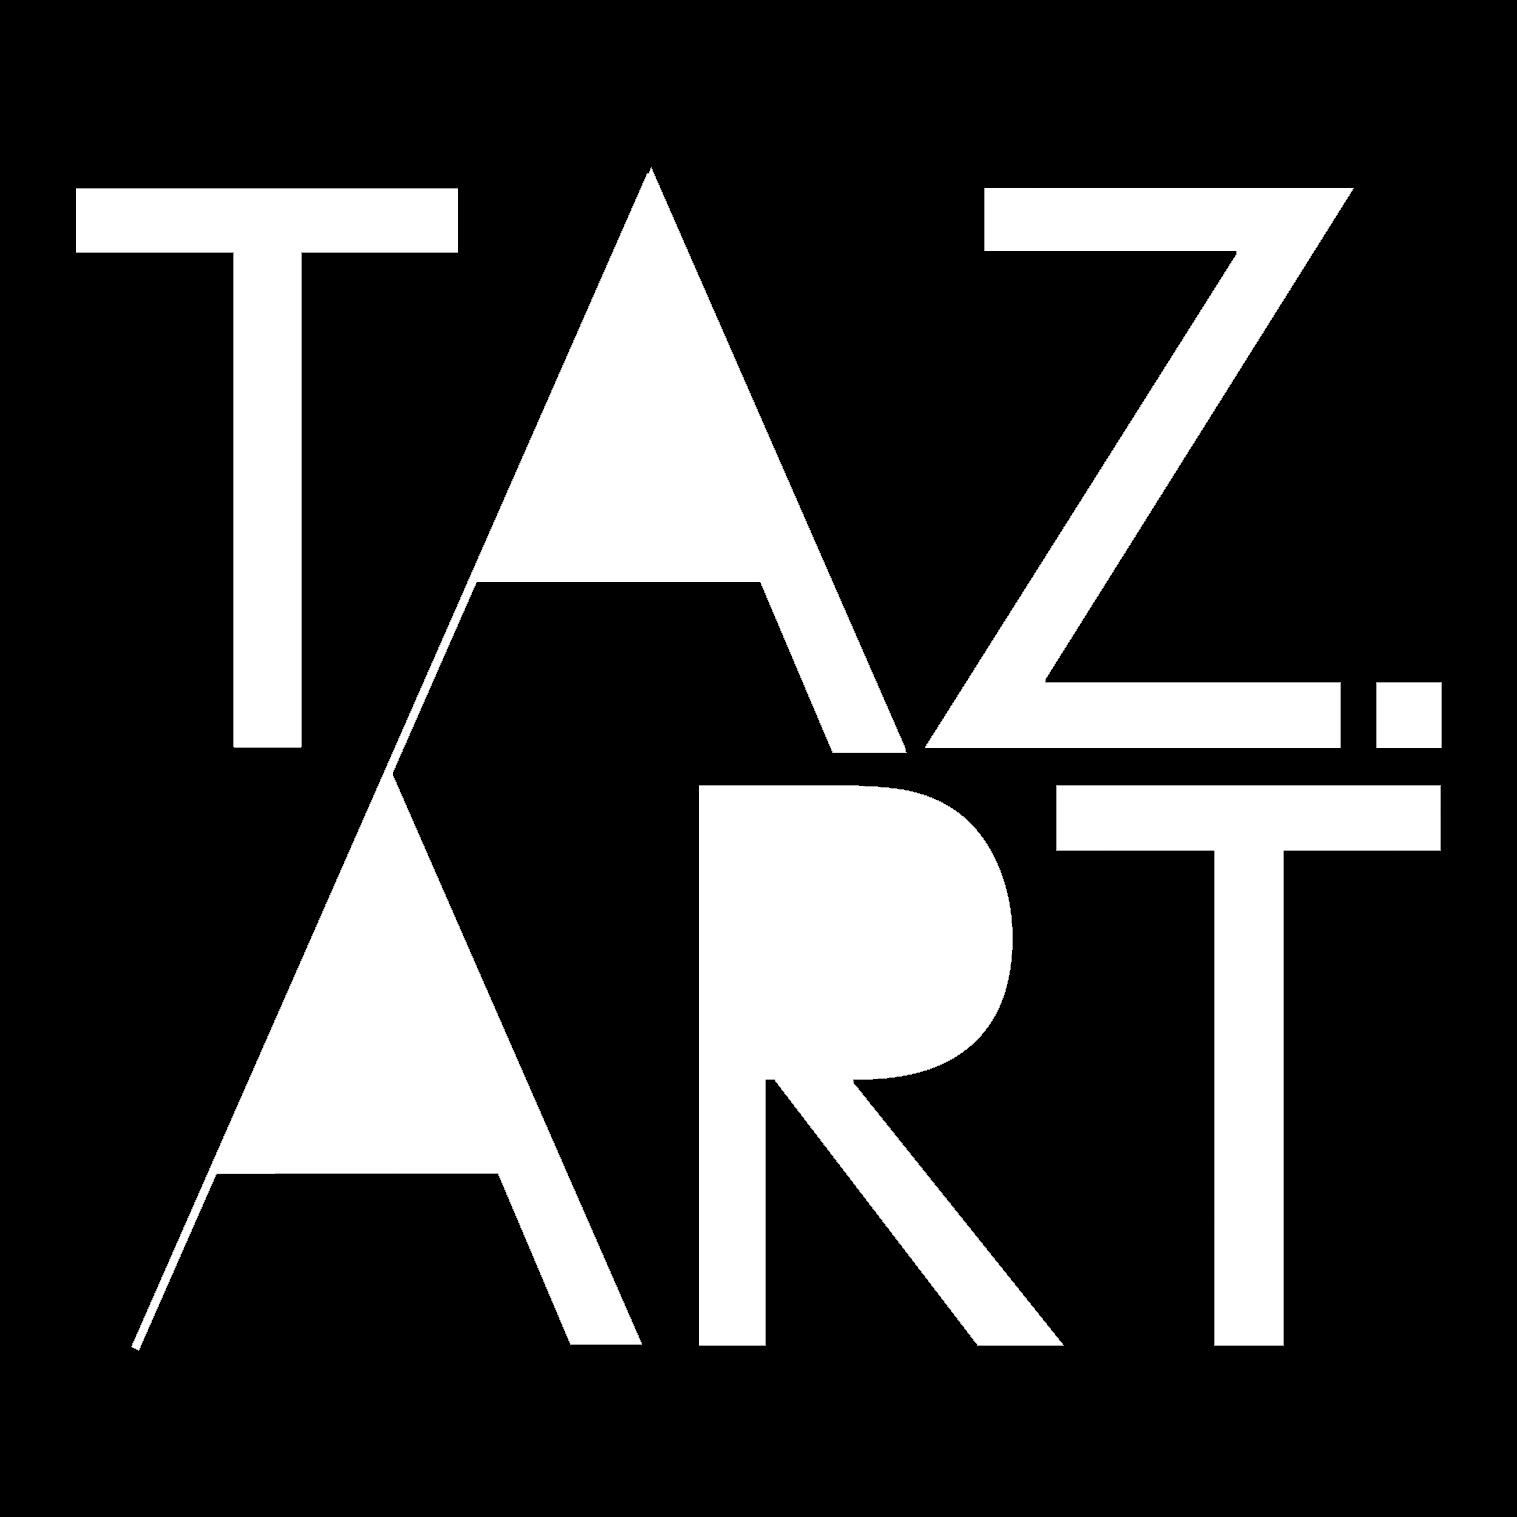 Tazart